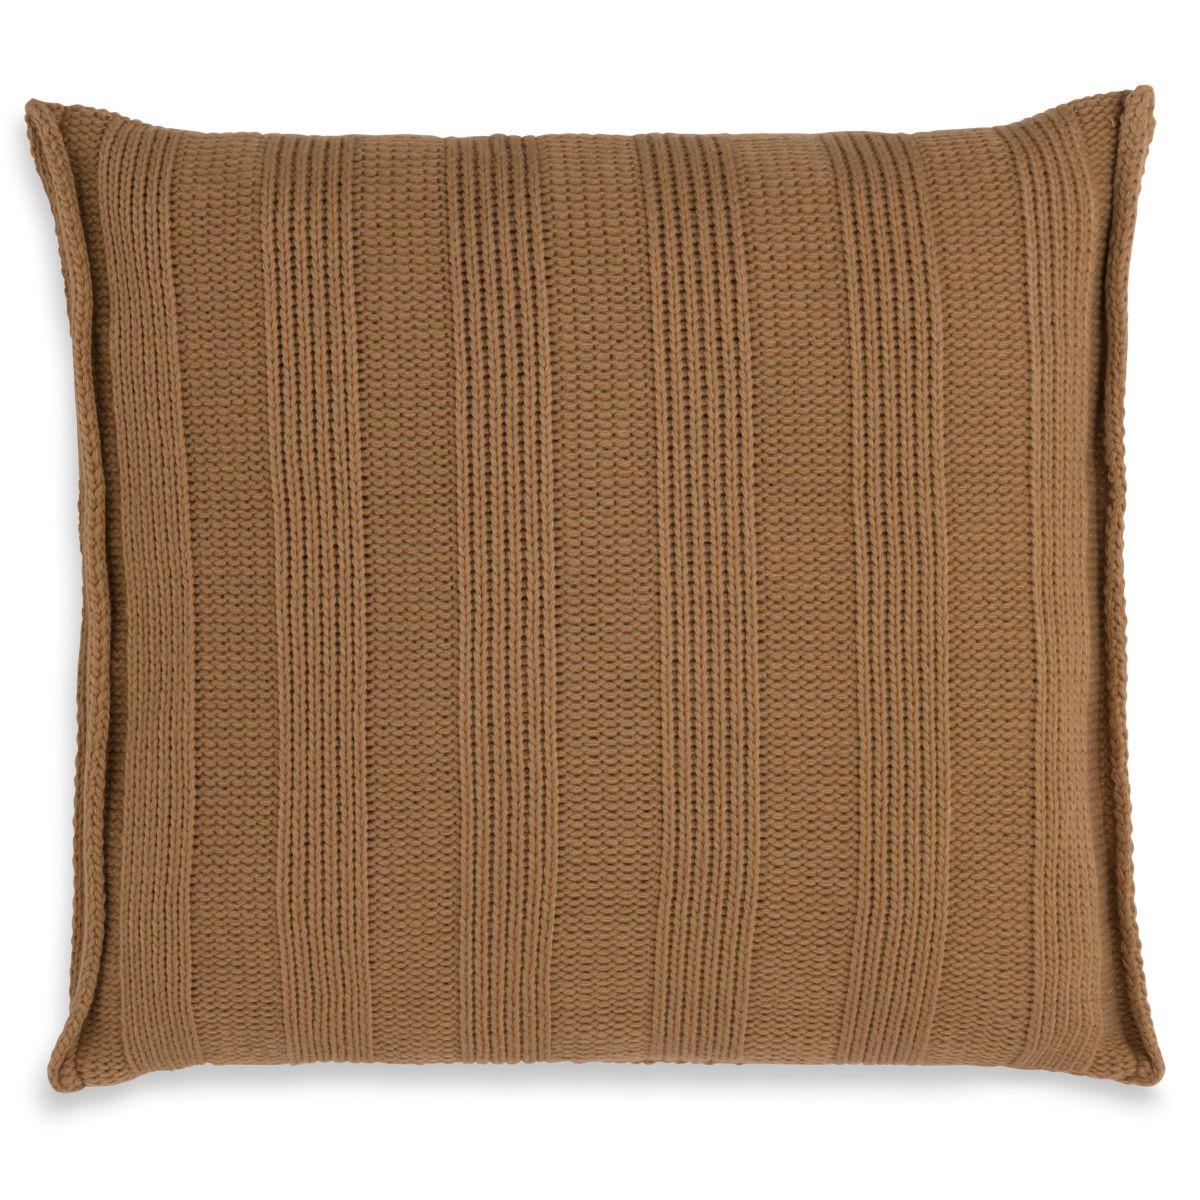 knit factory 1091220 kussen 50x50 jesse new camel 2